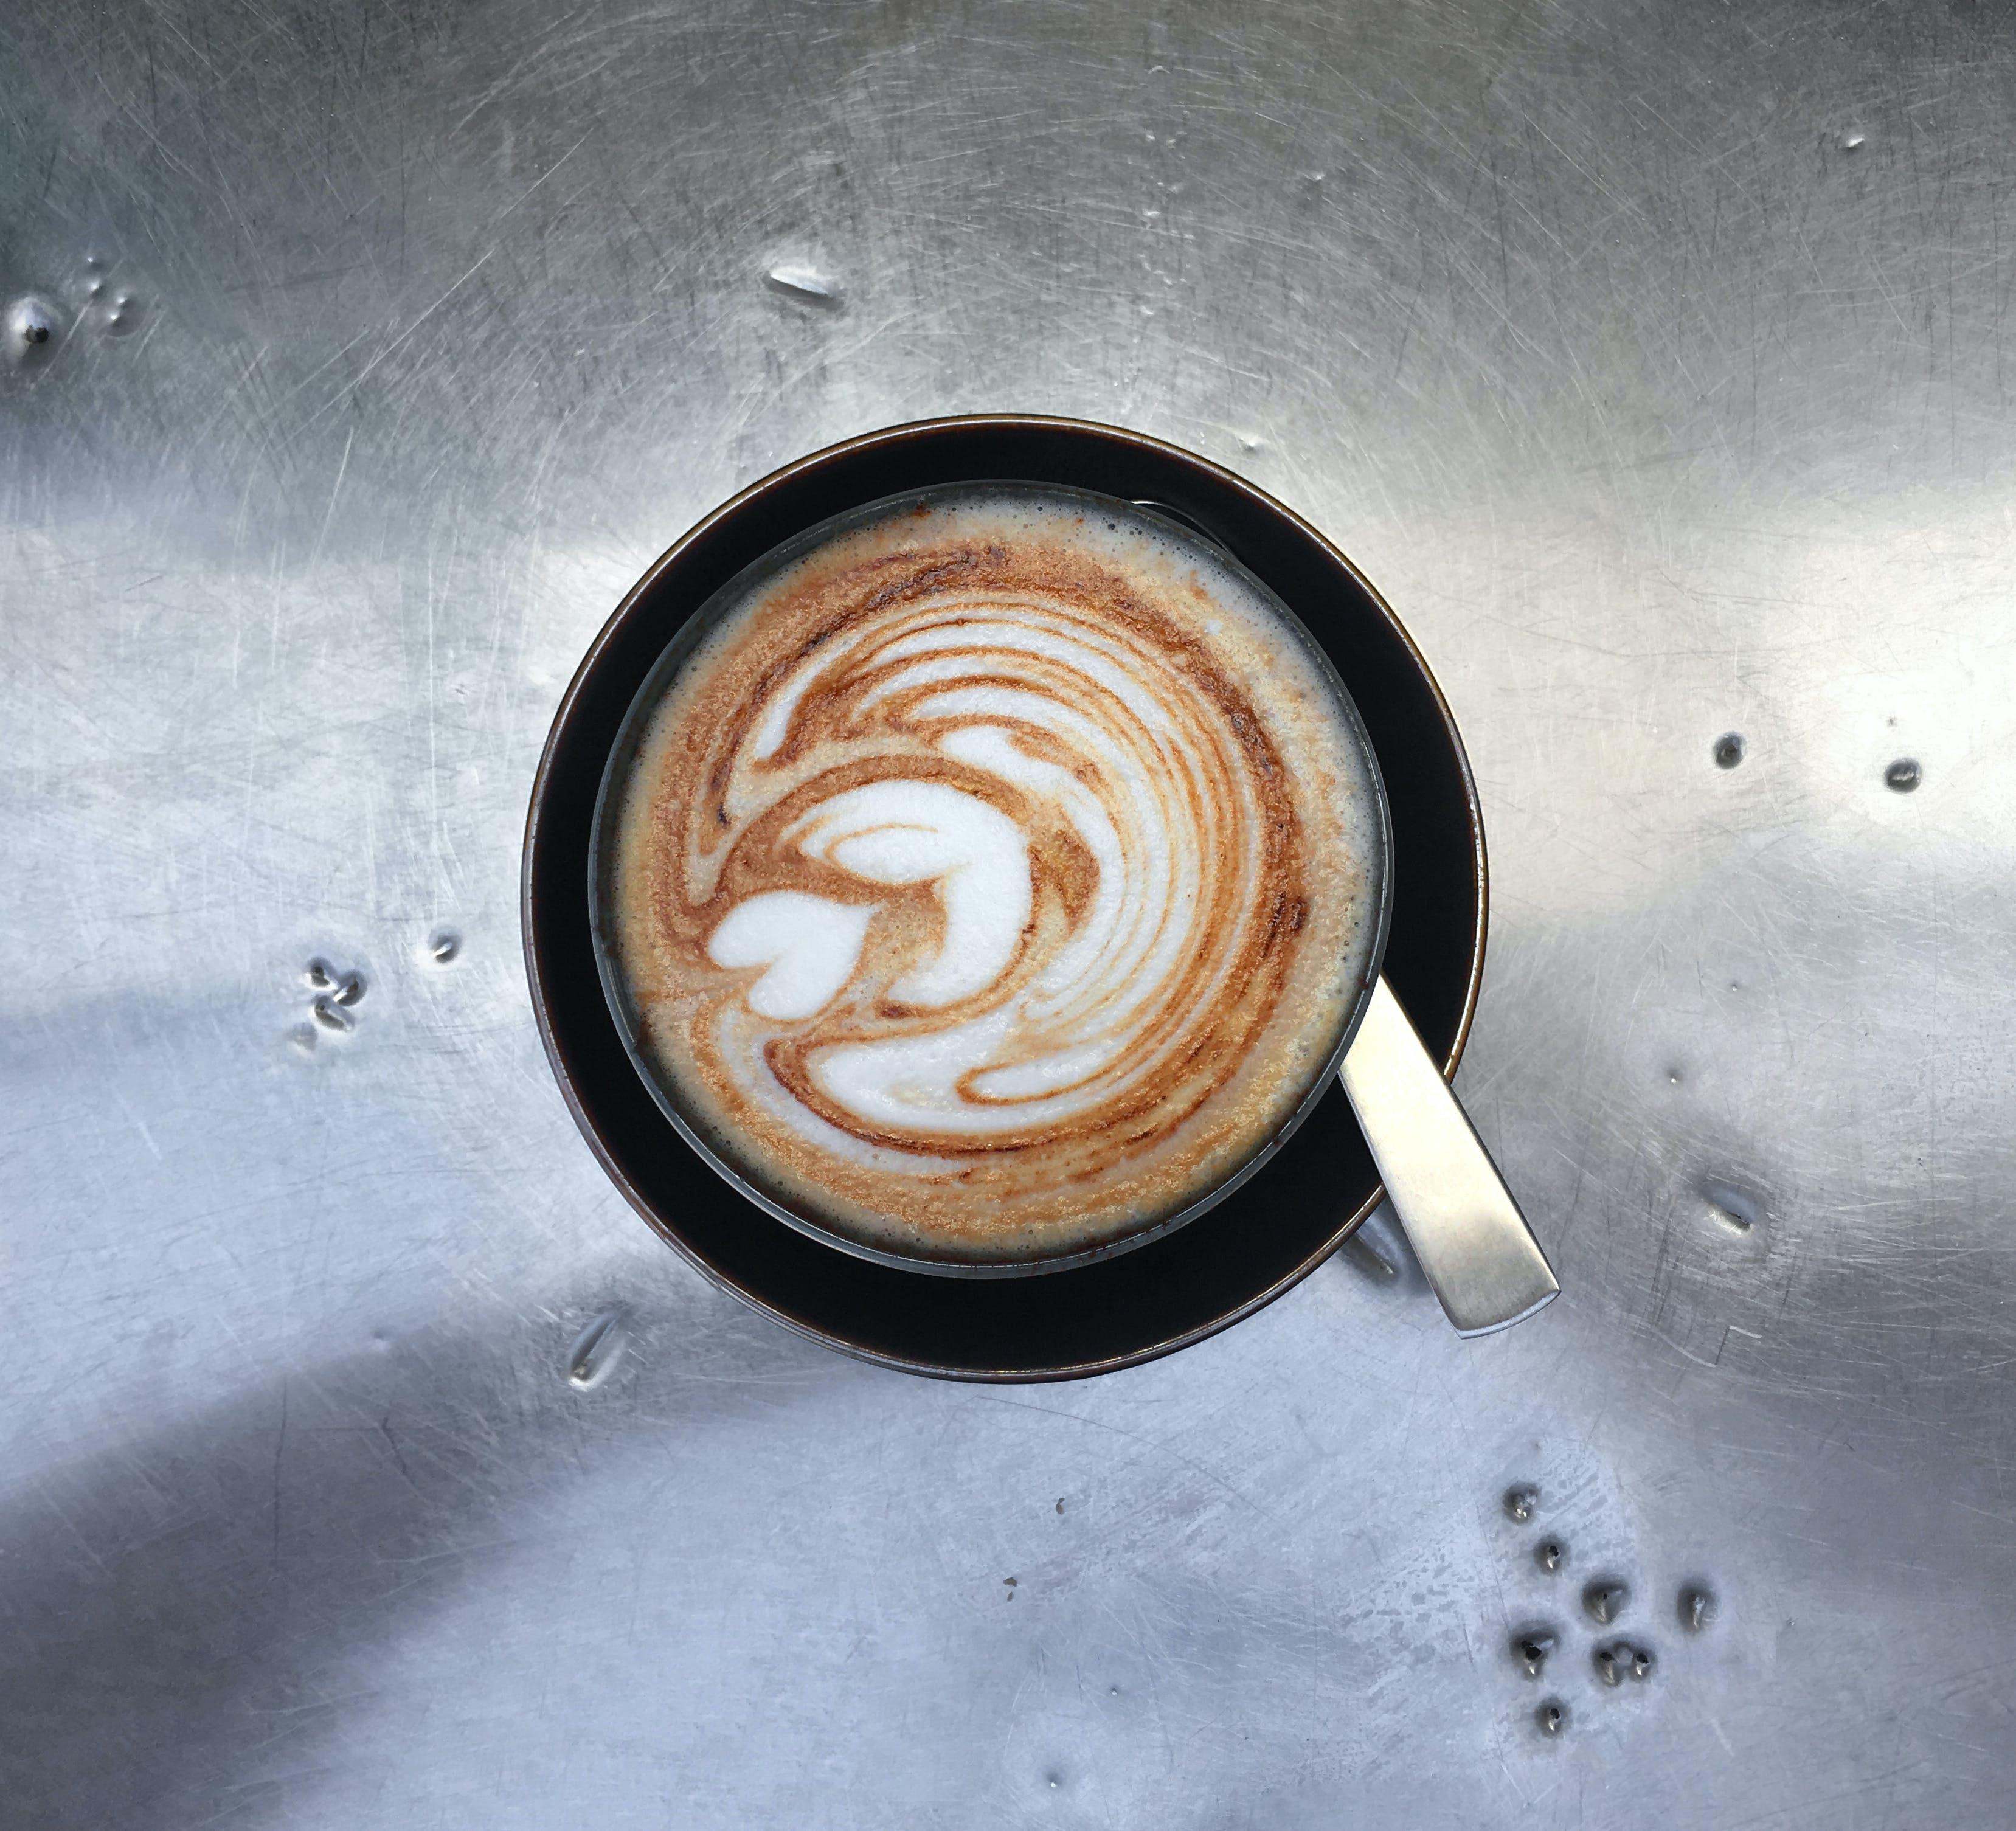 Gratis stockfoto met café koffie, cafeïne, cappuccino, drank